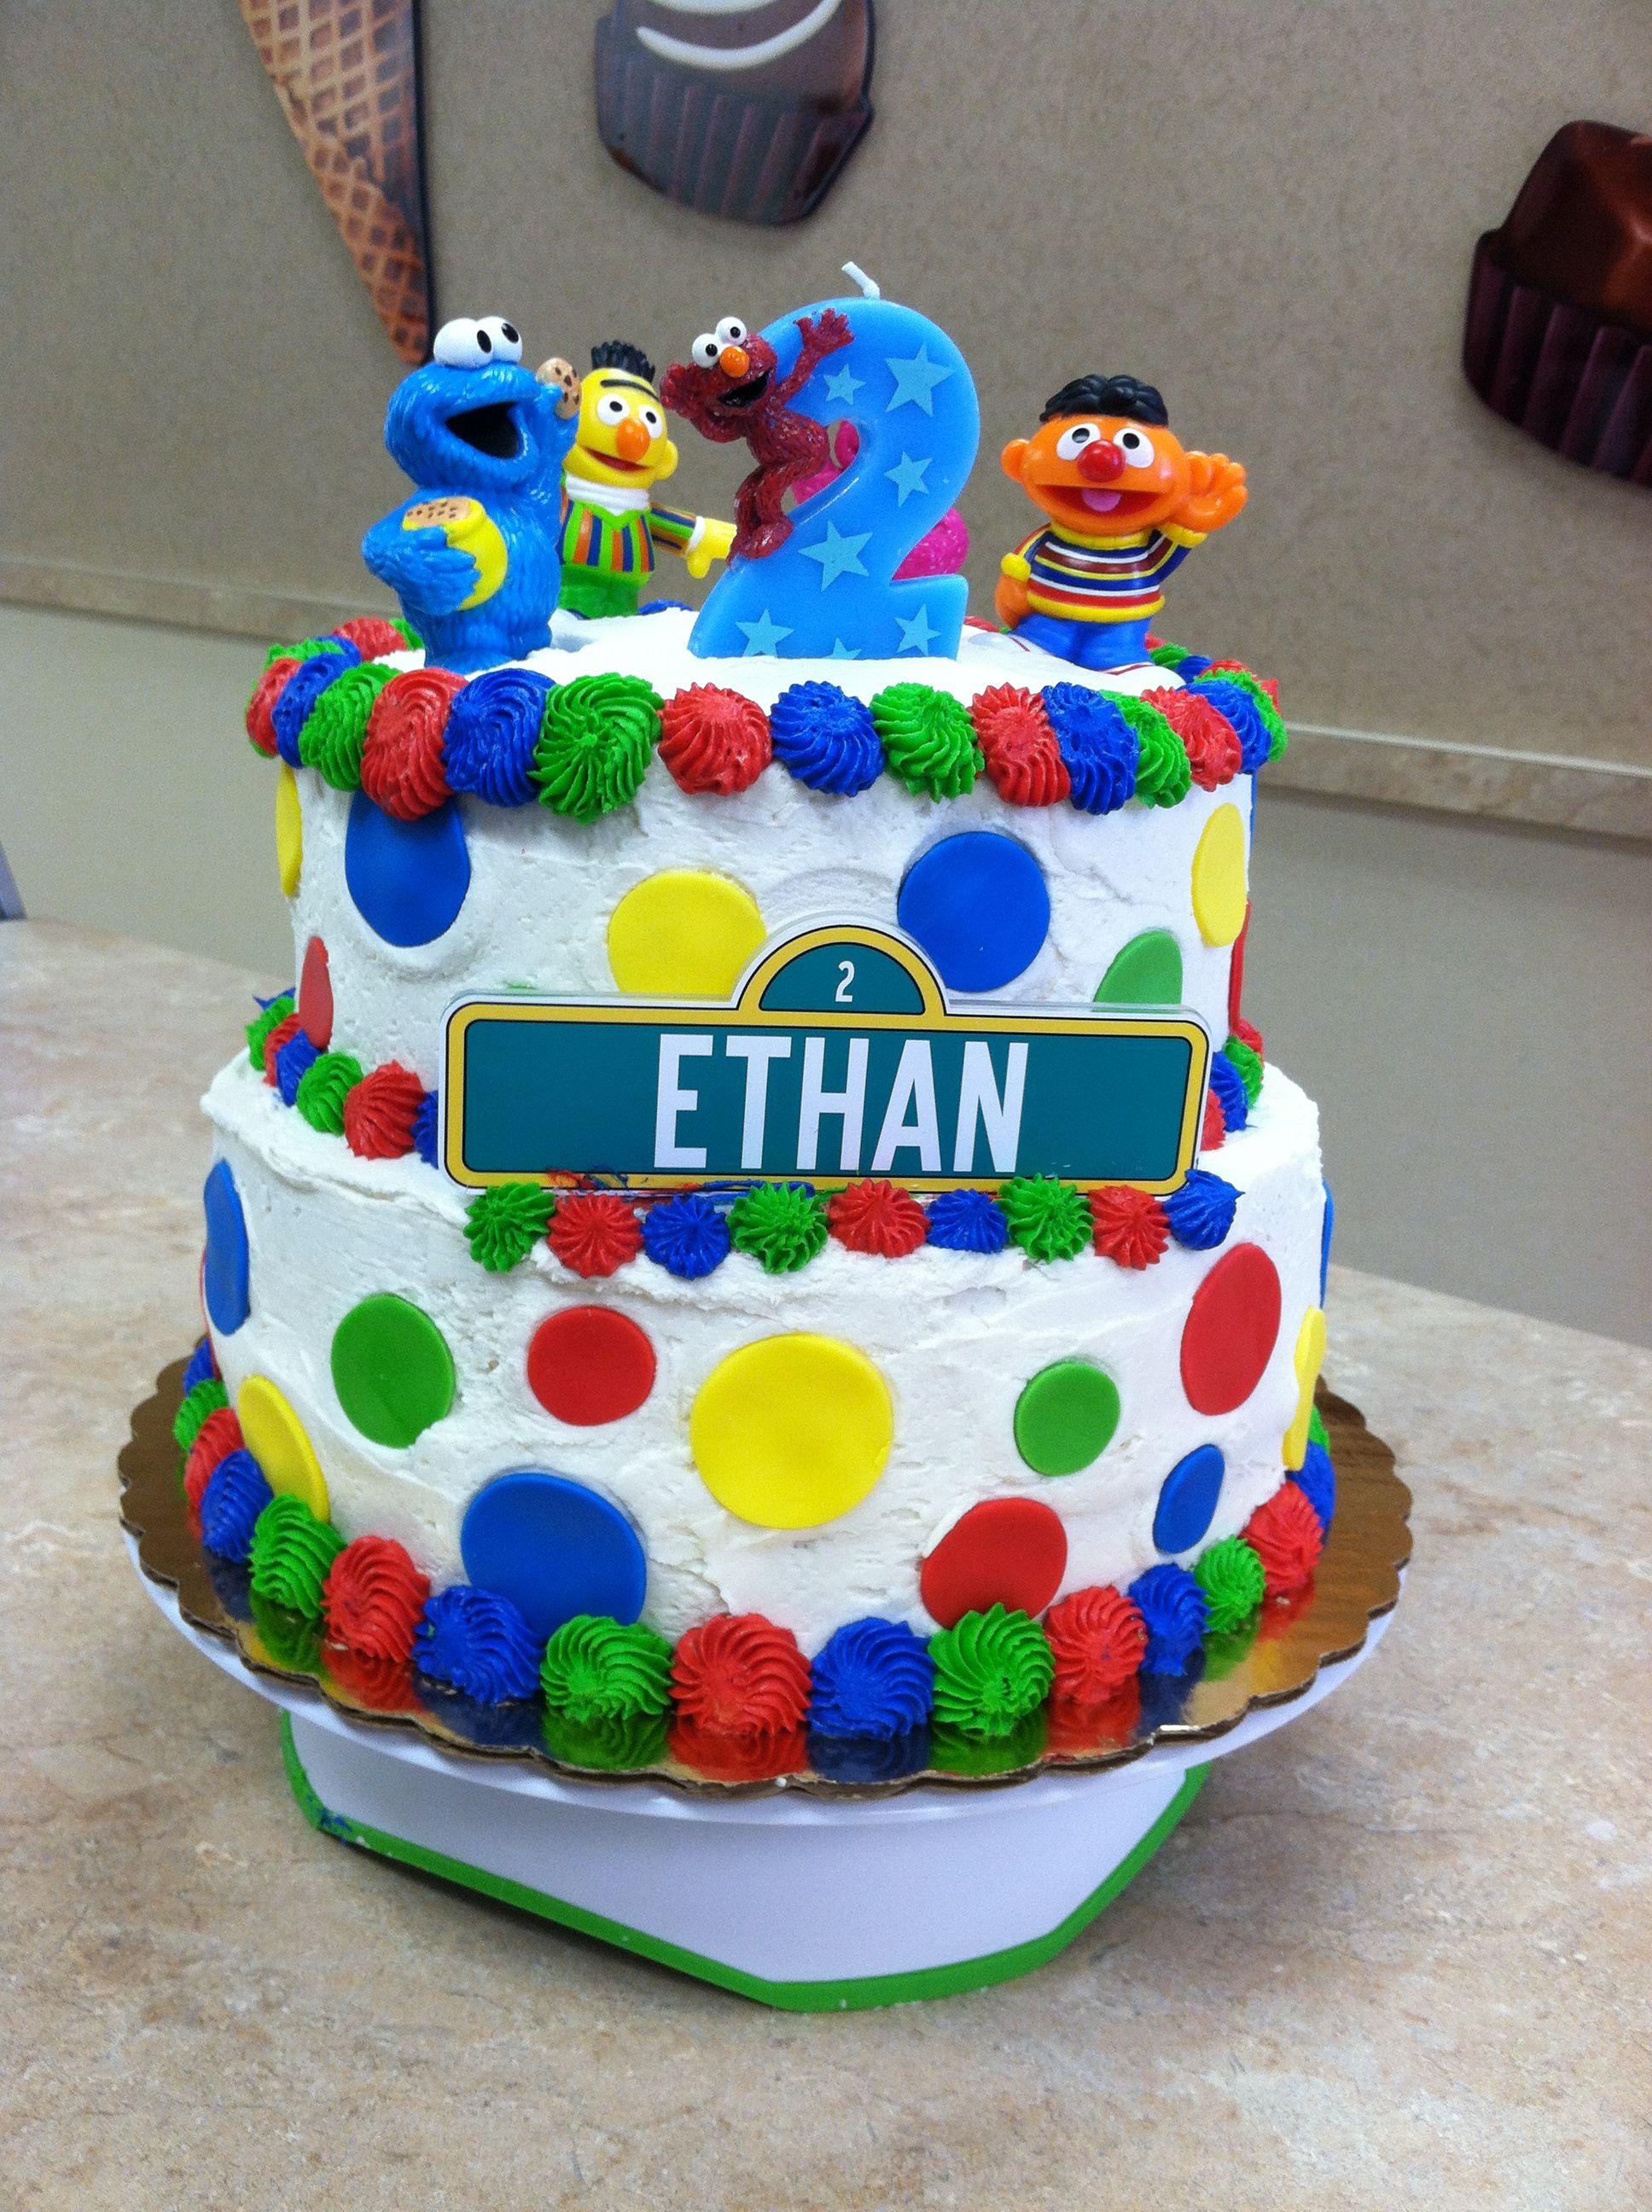 Remarkable Livay Sweet Shop Sesame Street Buttercream Cake Cakes Funny Birthday Cards Online Hetedamsfinfo